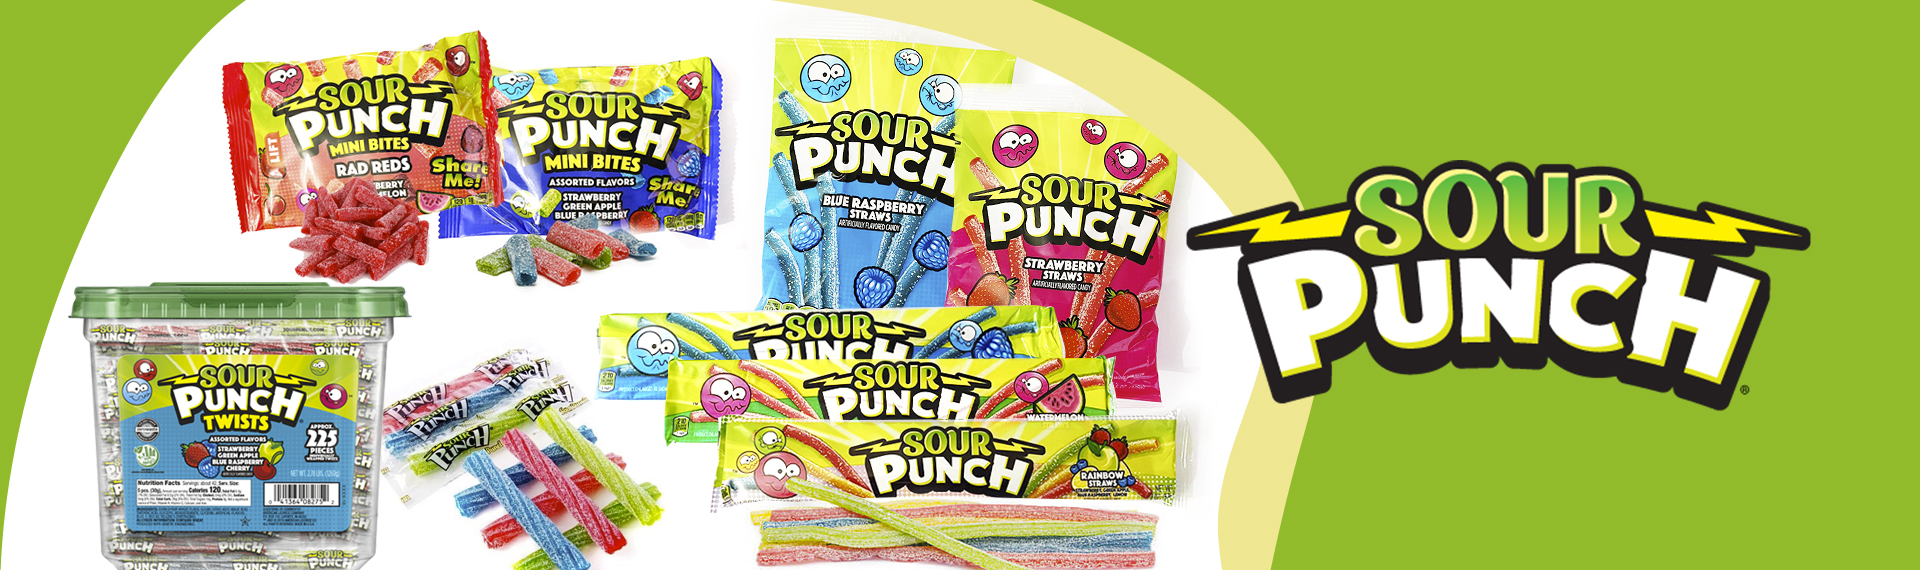 banner sour punch mix